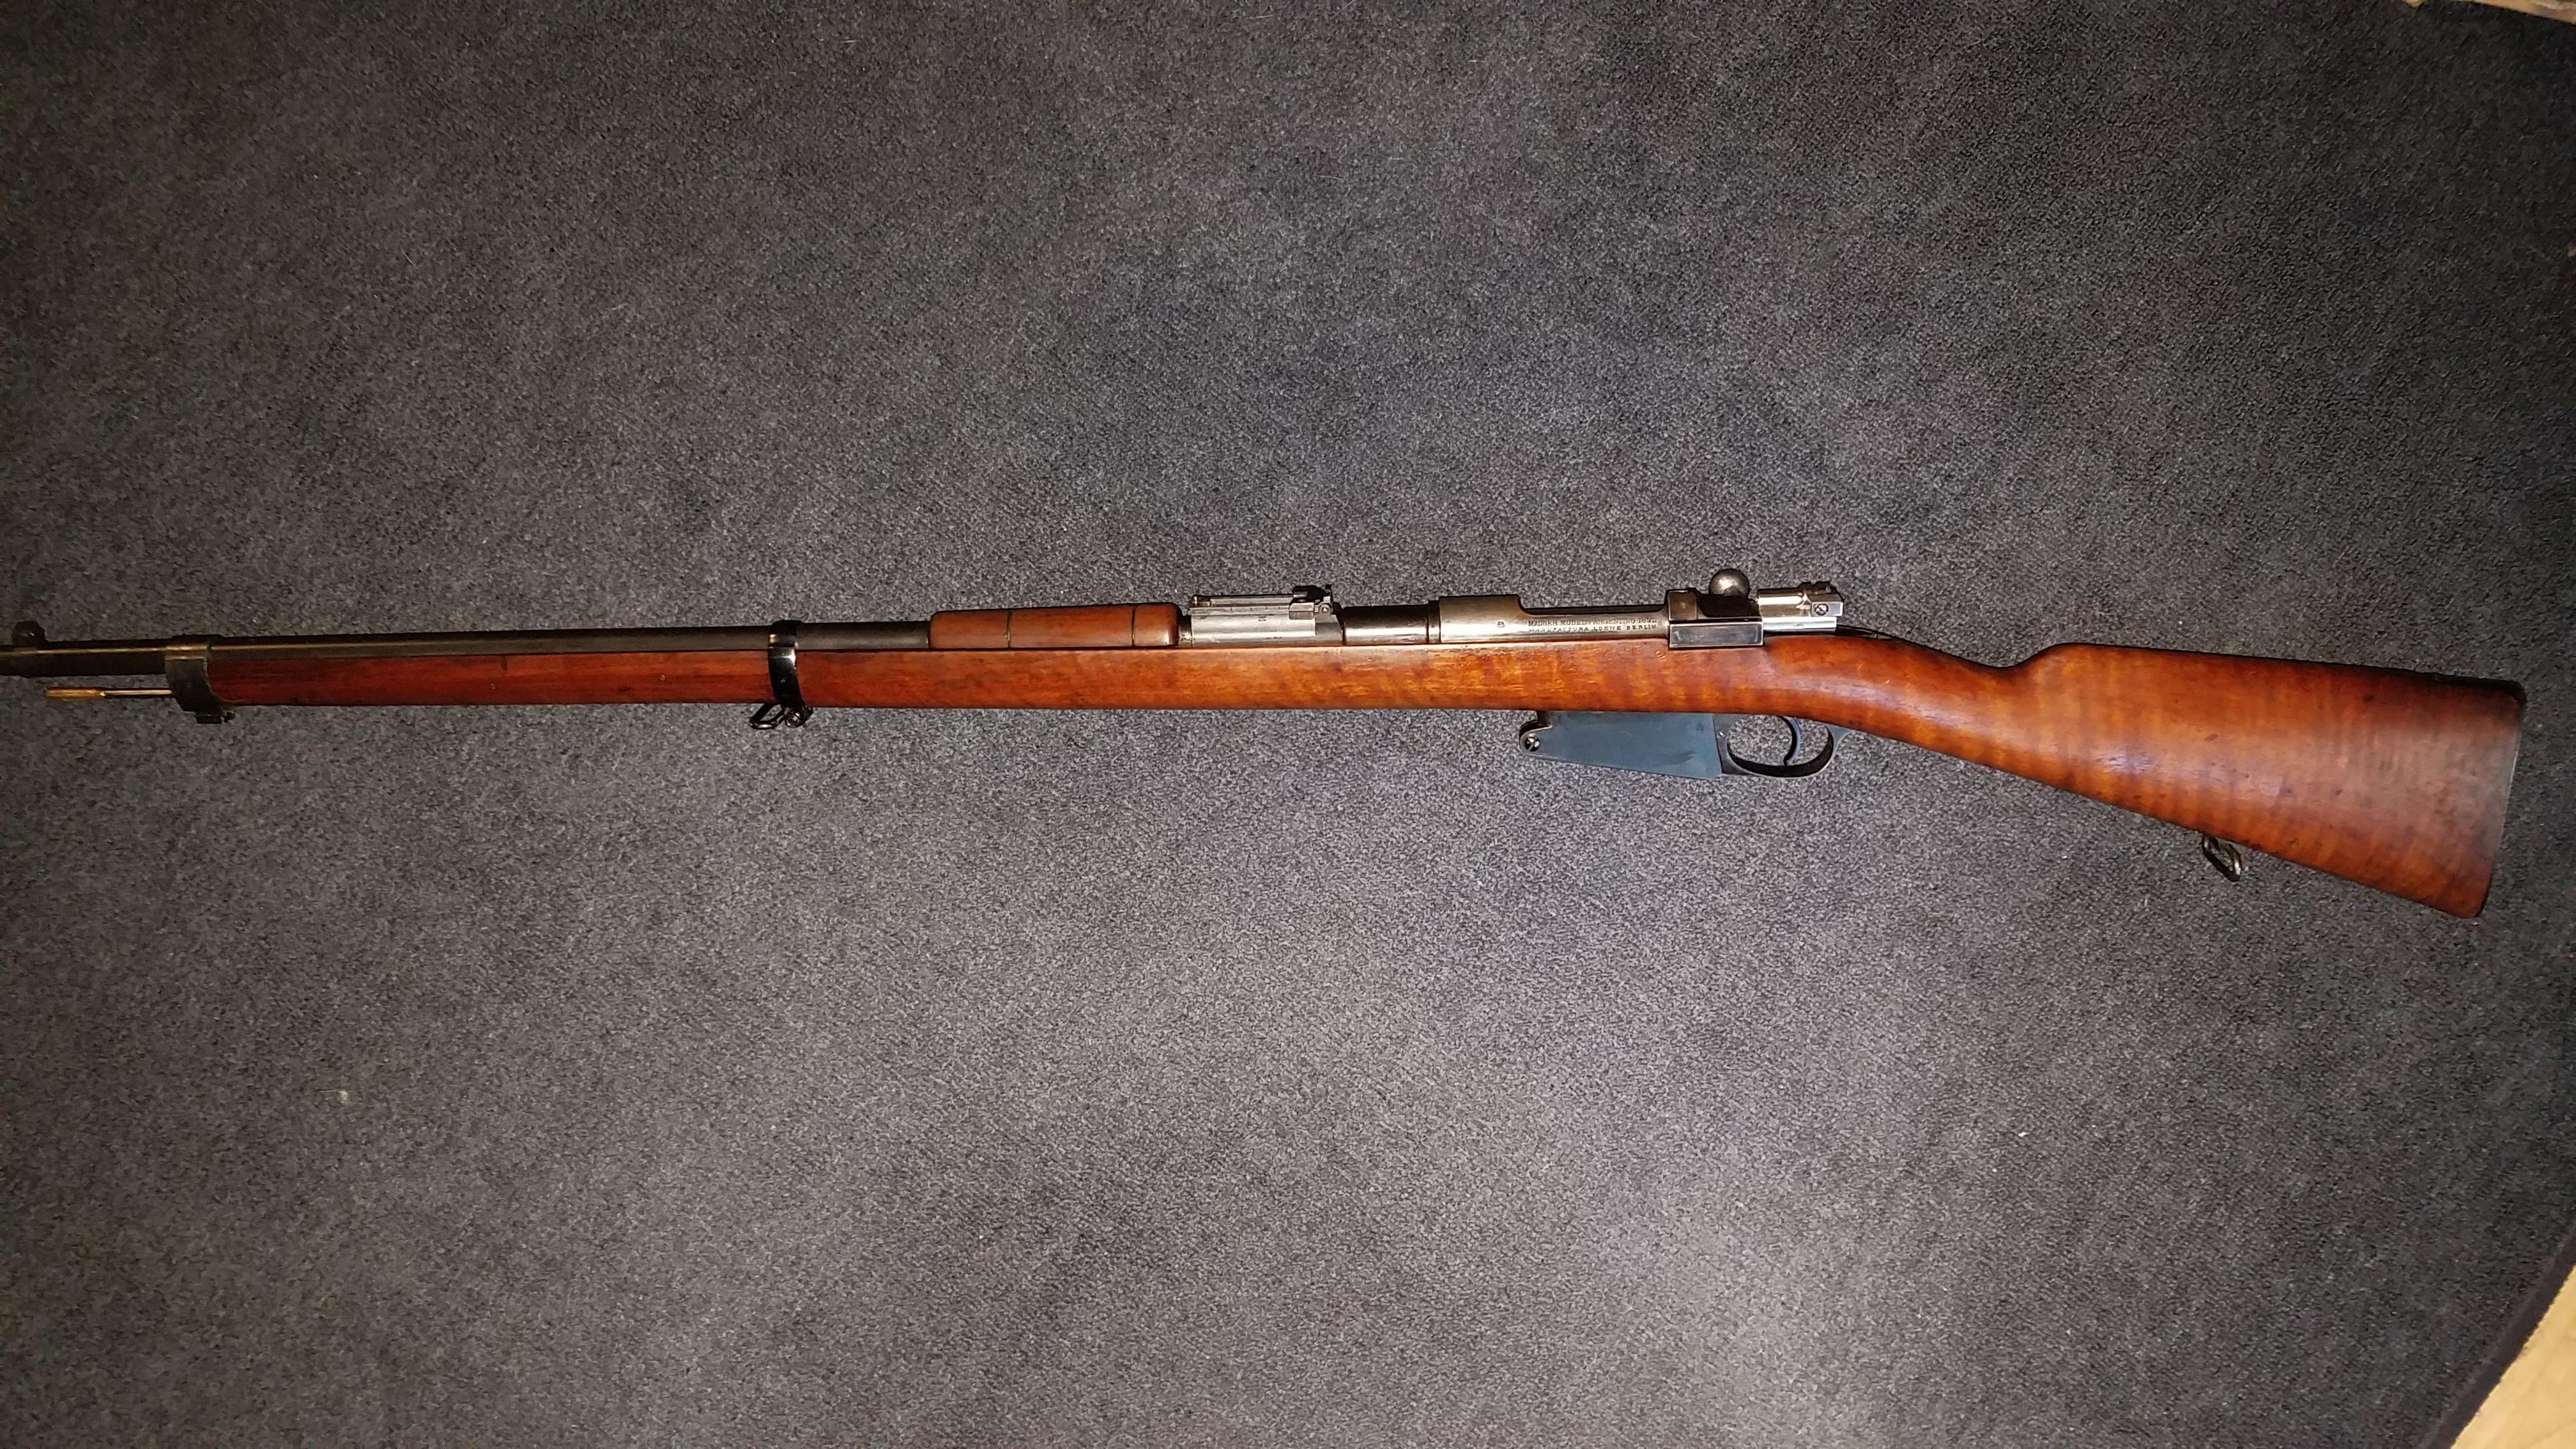 Mauser Model 1889 - Wikipedia